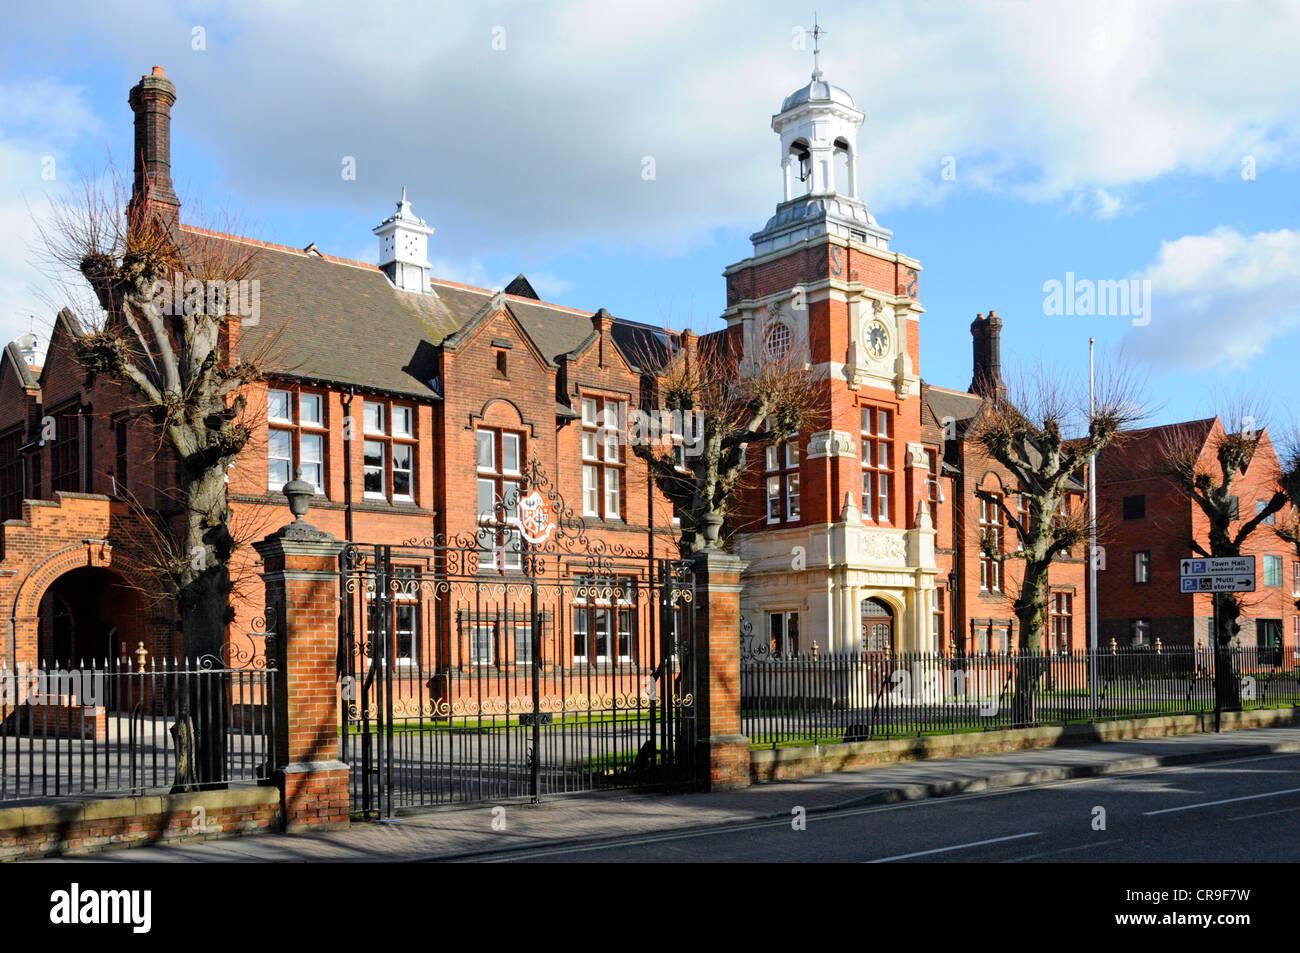 How Old Is Wakeman School Building Shrewsbury